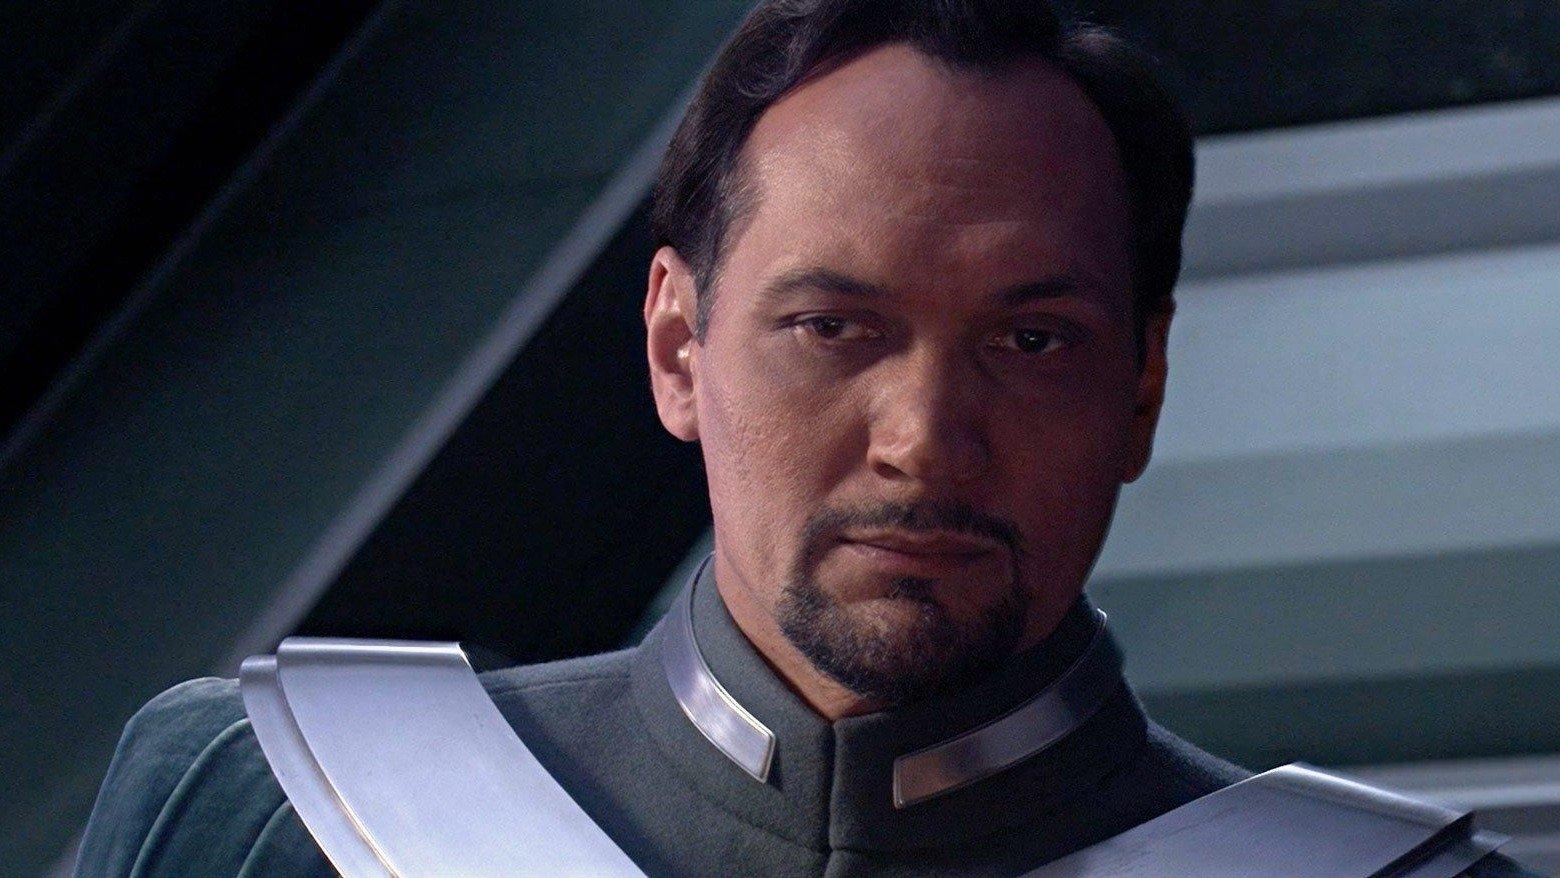 Star Wars: Rogue One contará con un cameo de Bail Organa